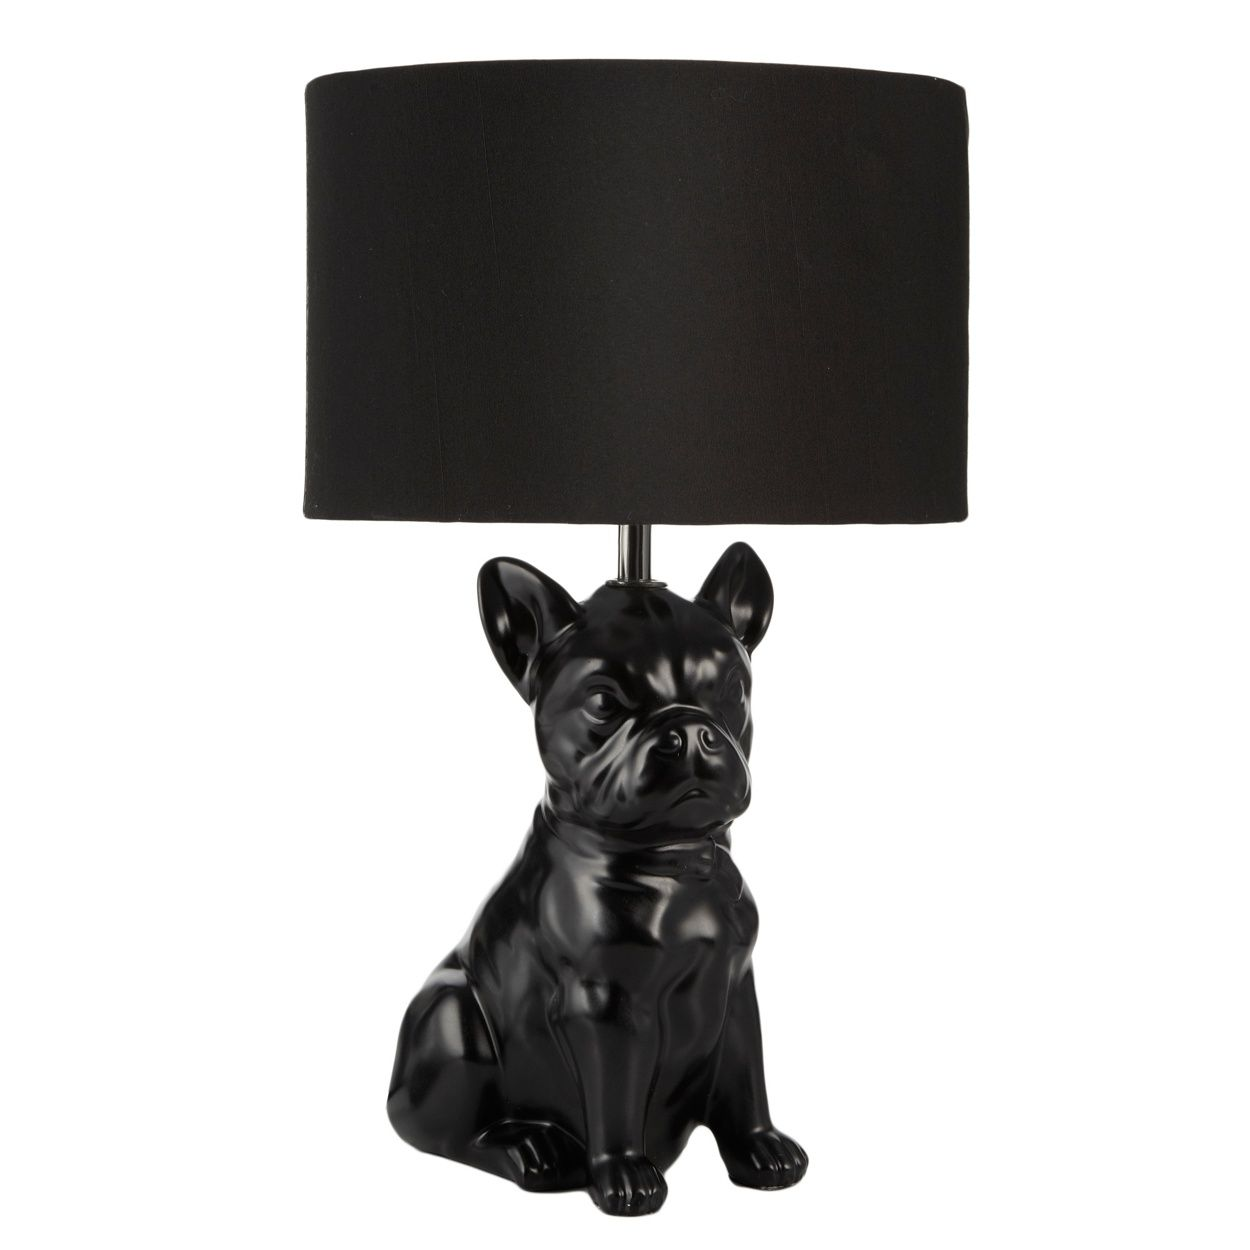 Ben de lisi black dog table lamp at debenhams com